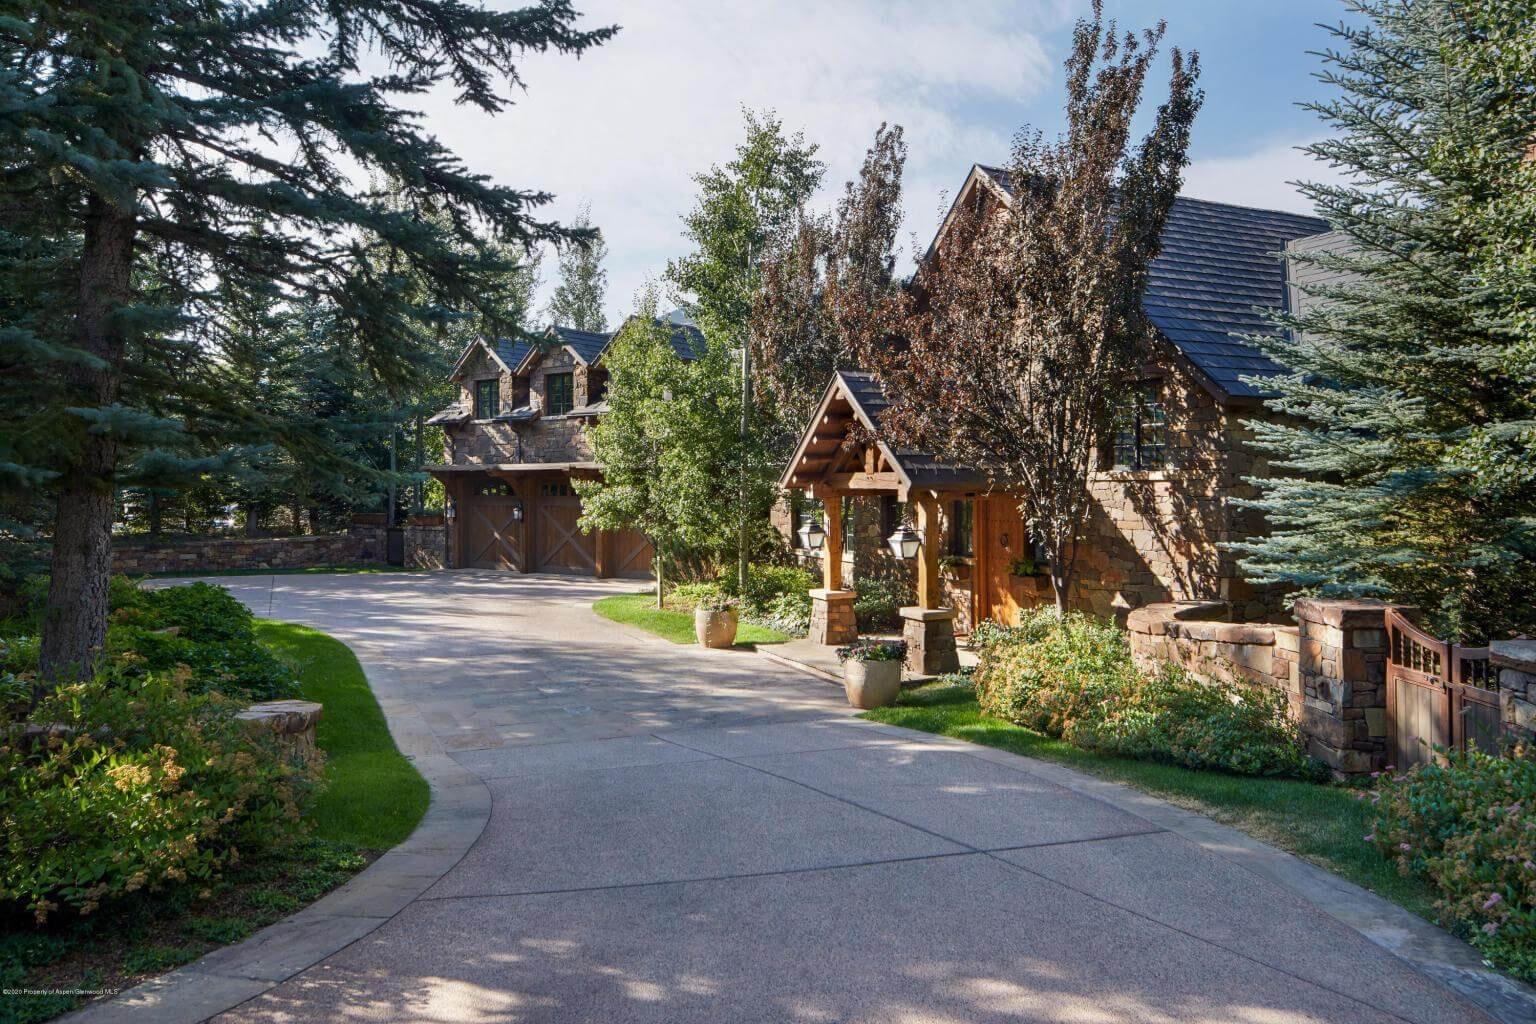 Aspen Snowmass Real Estate Continues its Skyward Climb, ADN Image